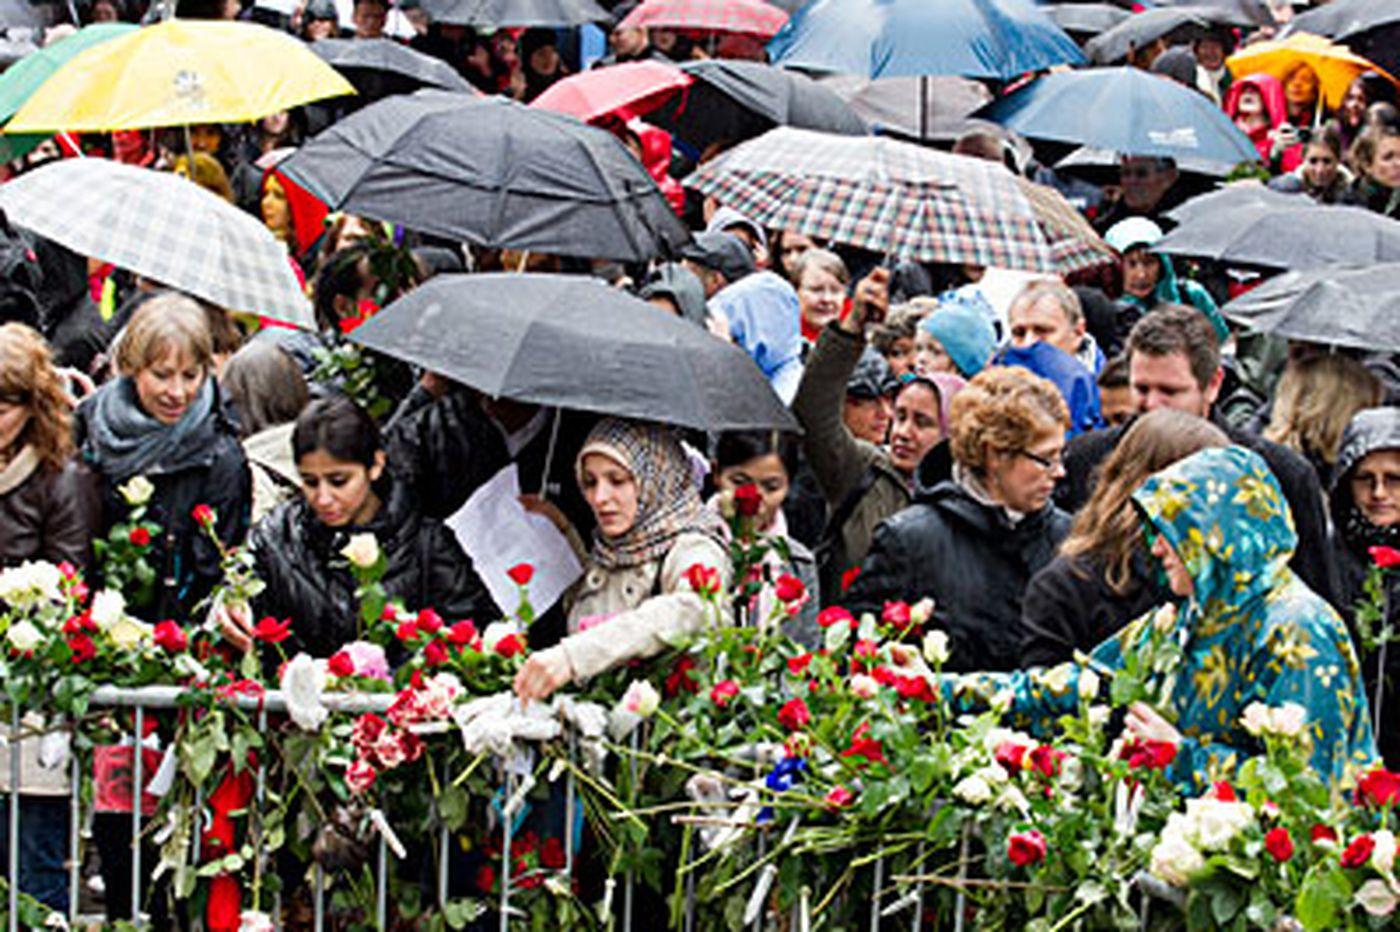 Norwegians raise voices to protest killer